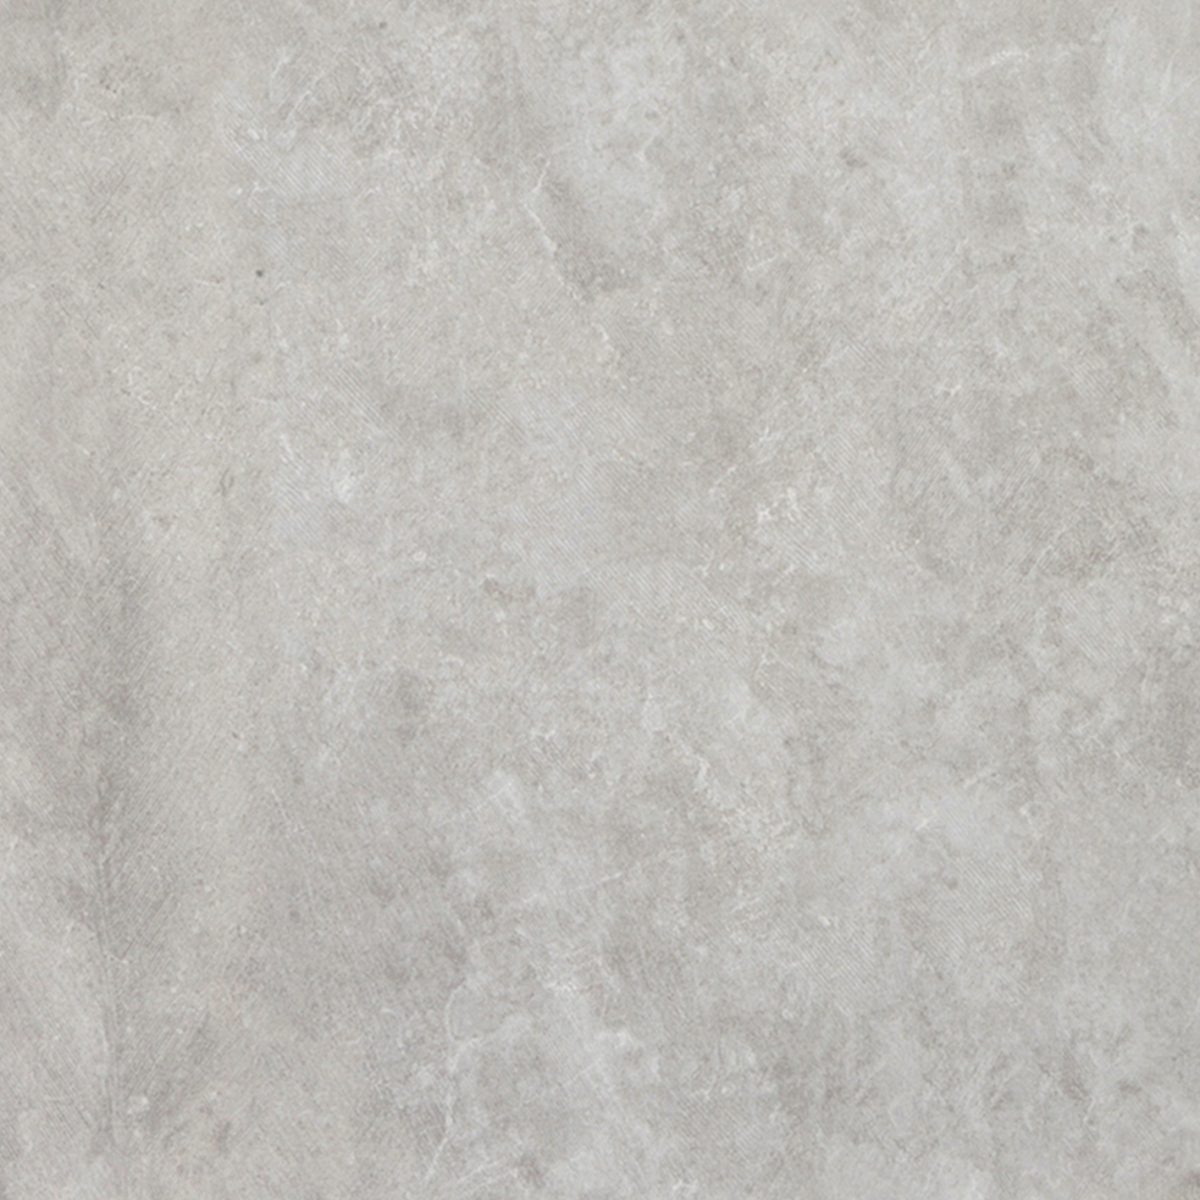 Porcelanosa Rodano Acero Anti-Slip Tile 120 x 120 cm